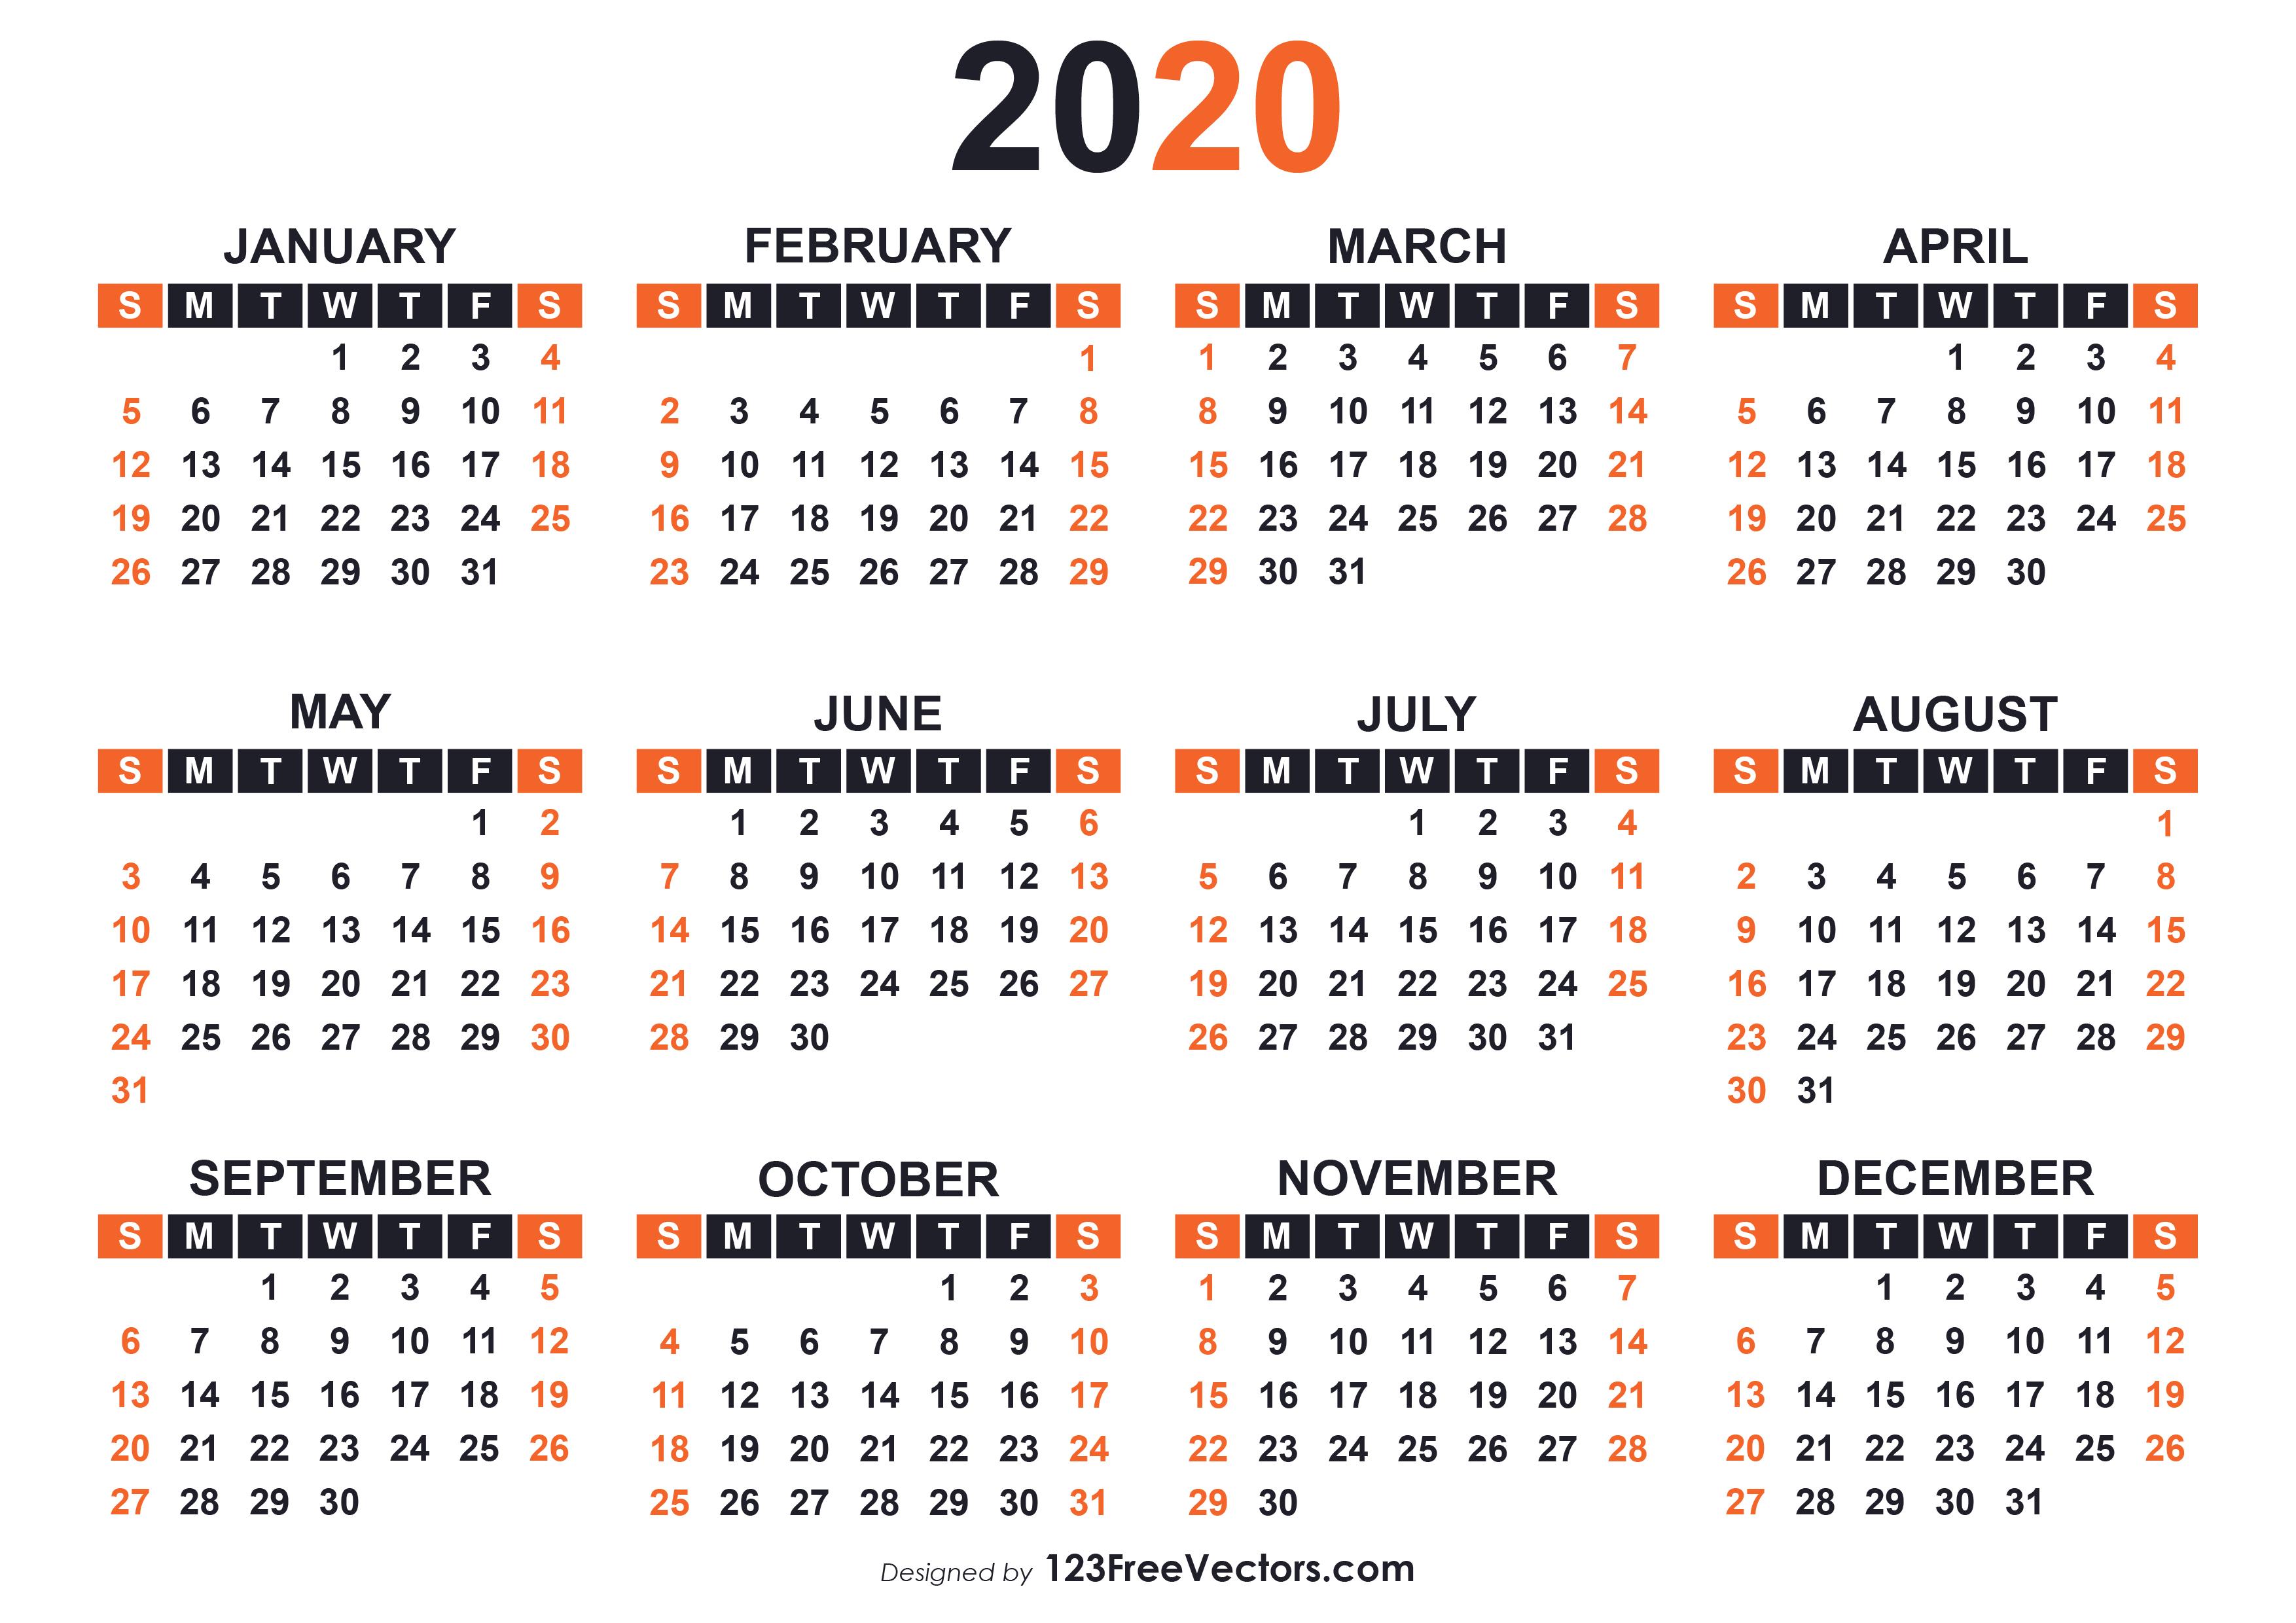 Free Calendar 2020 Printable.2020 Free Printable Calendar Templates